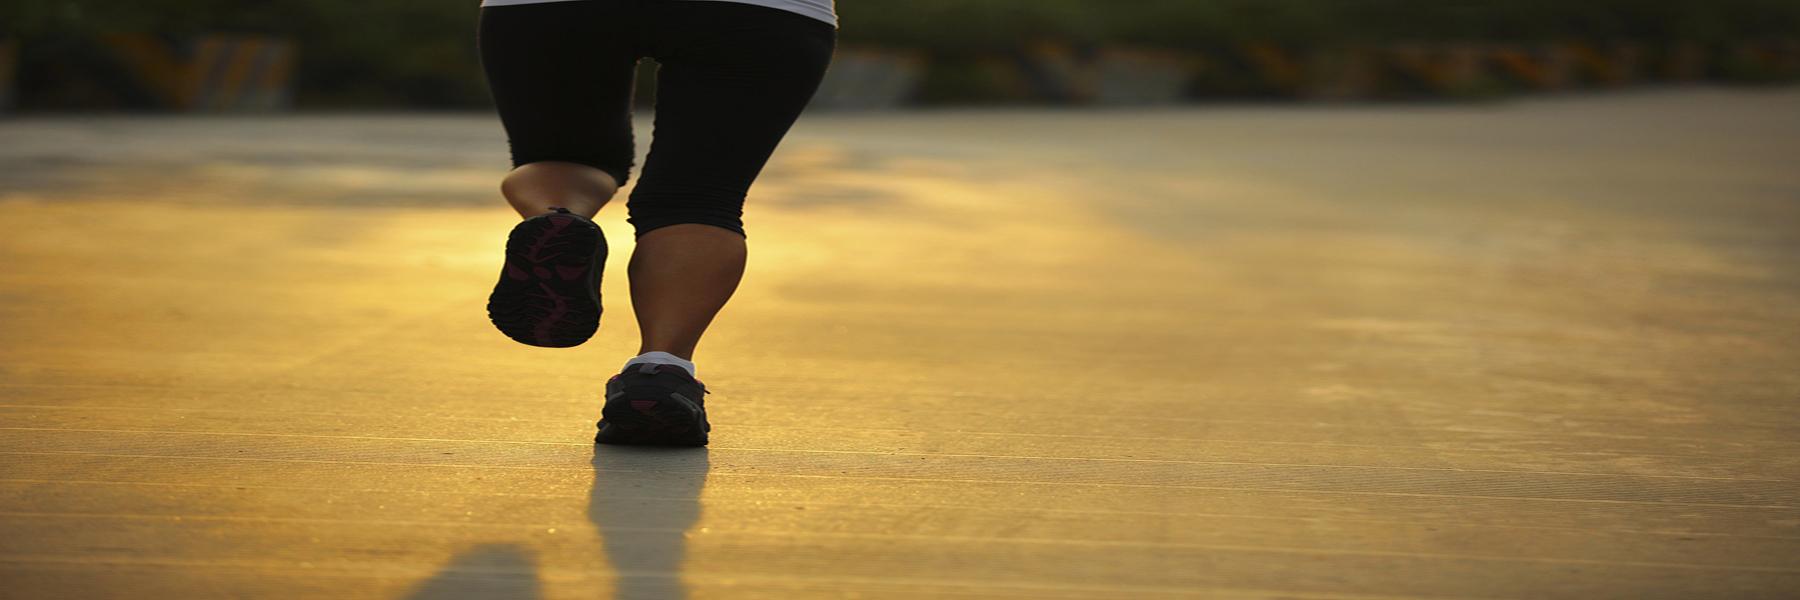 Exercise-Morning blog